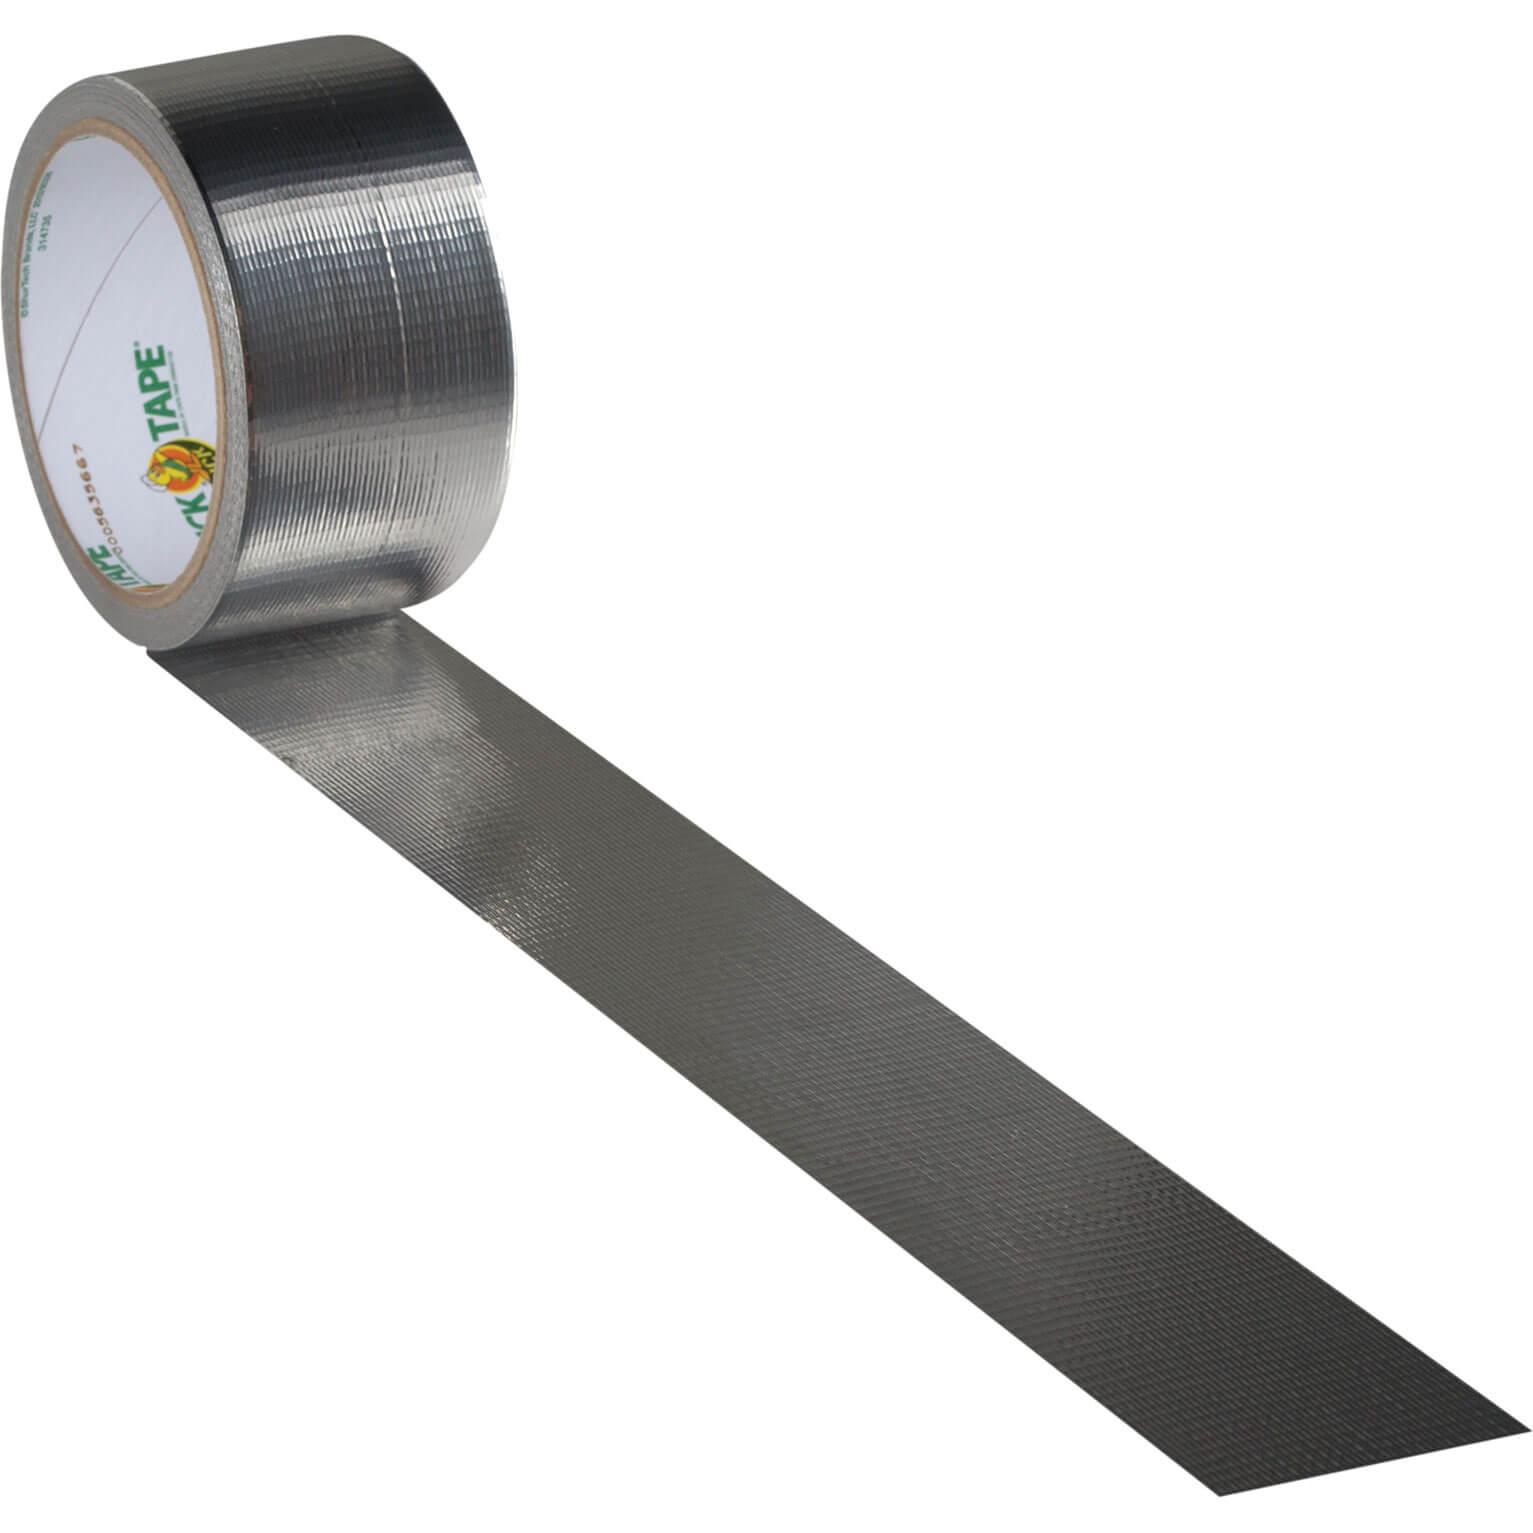 Image of Shure Multi Coloured Duck Tape Bit-O-Bling Silver